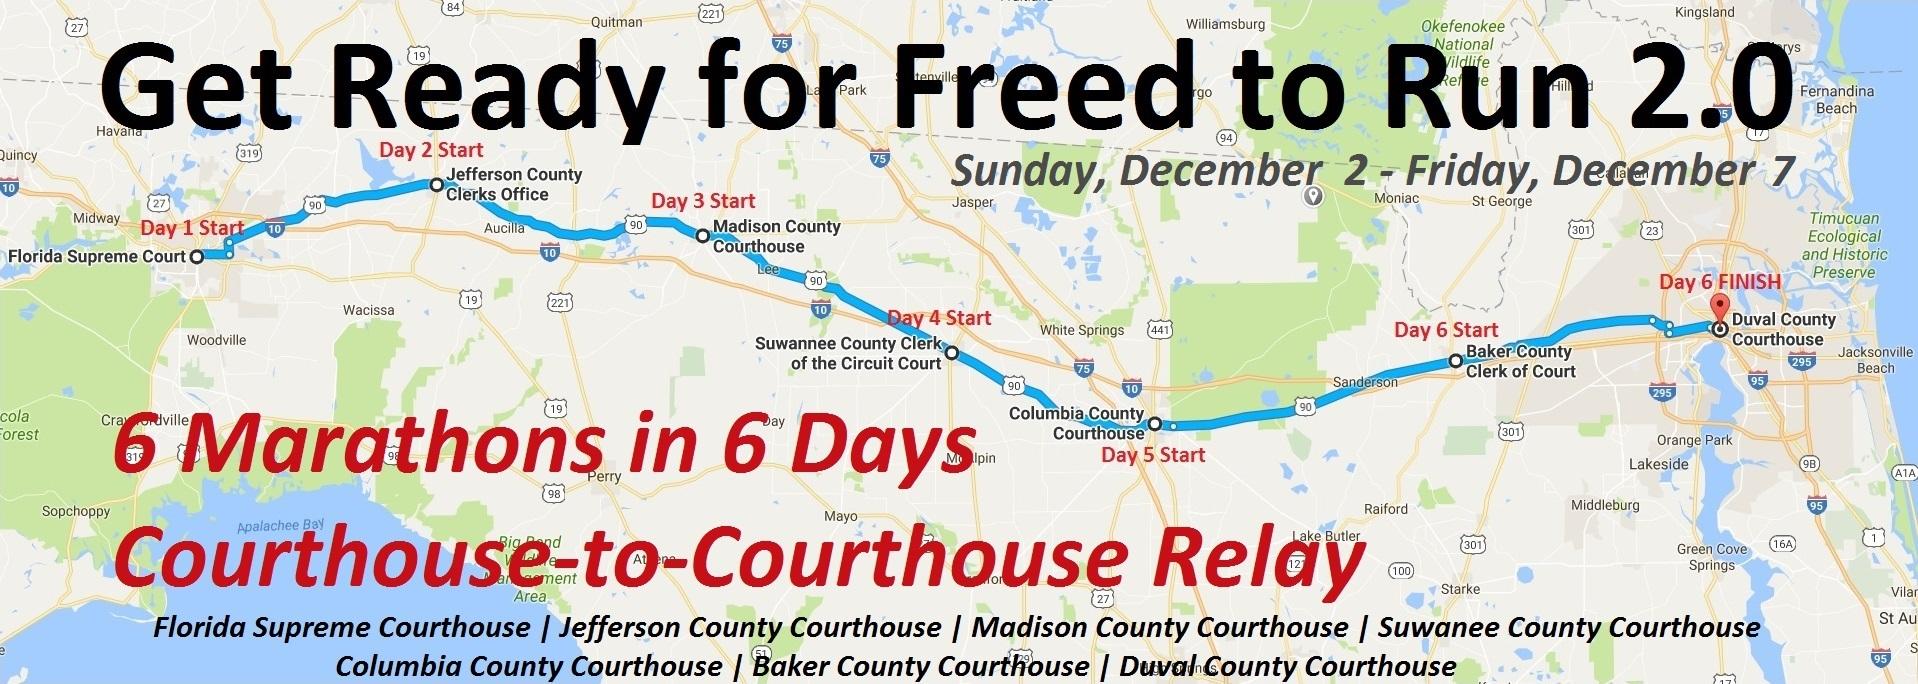 Freed To Run Team Jacksonville Area Legal Aid Inc